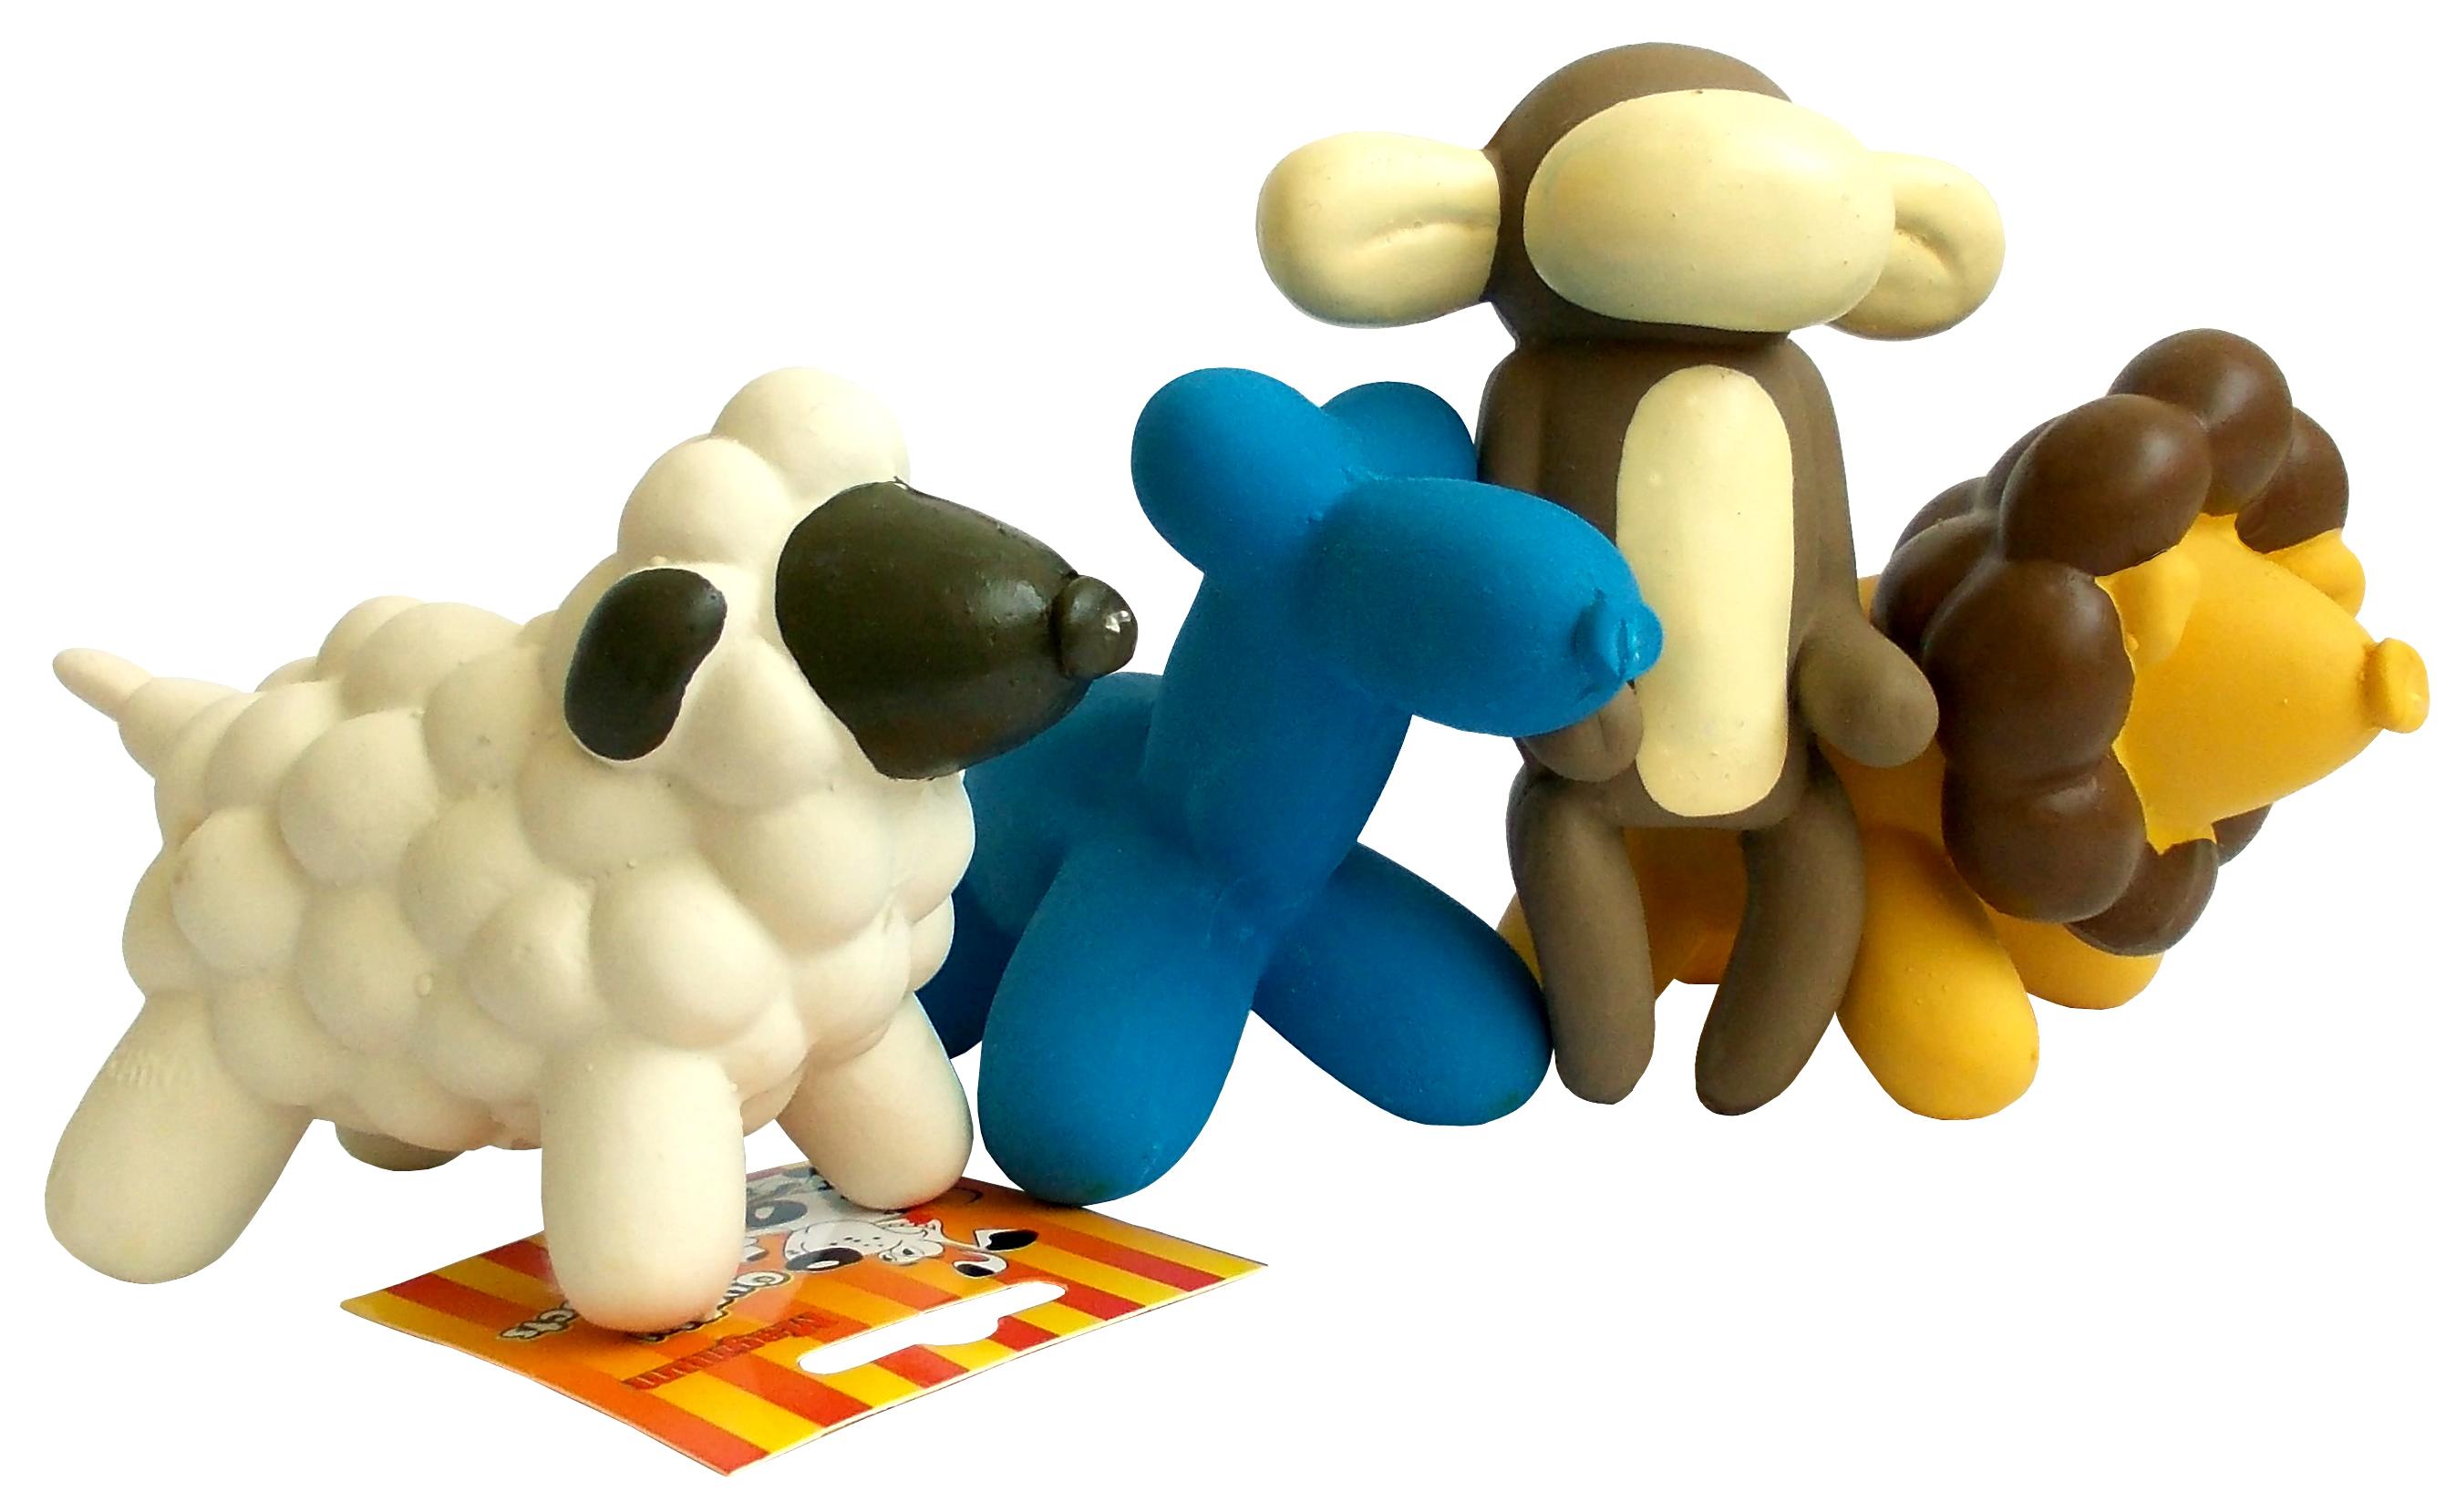 Hračka mini latex 24cm (pes,opice,ovečka,lvíček)